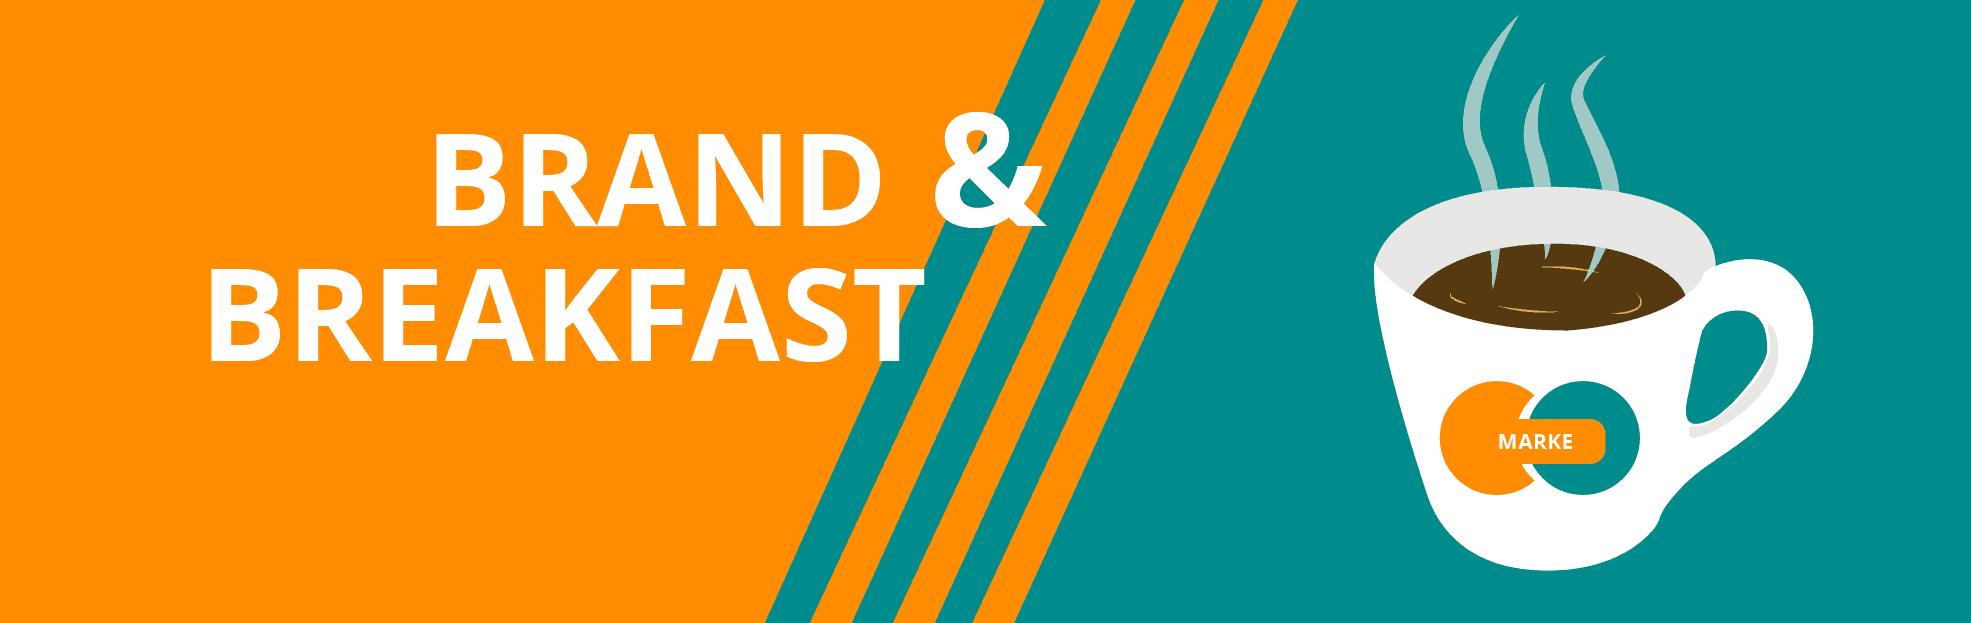 Brand and Breakfast - Purpose - Creative Advantage